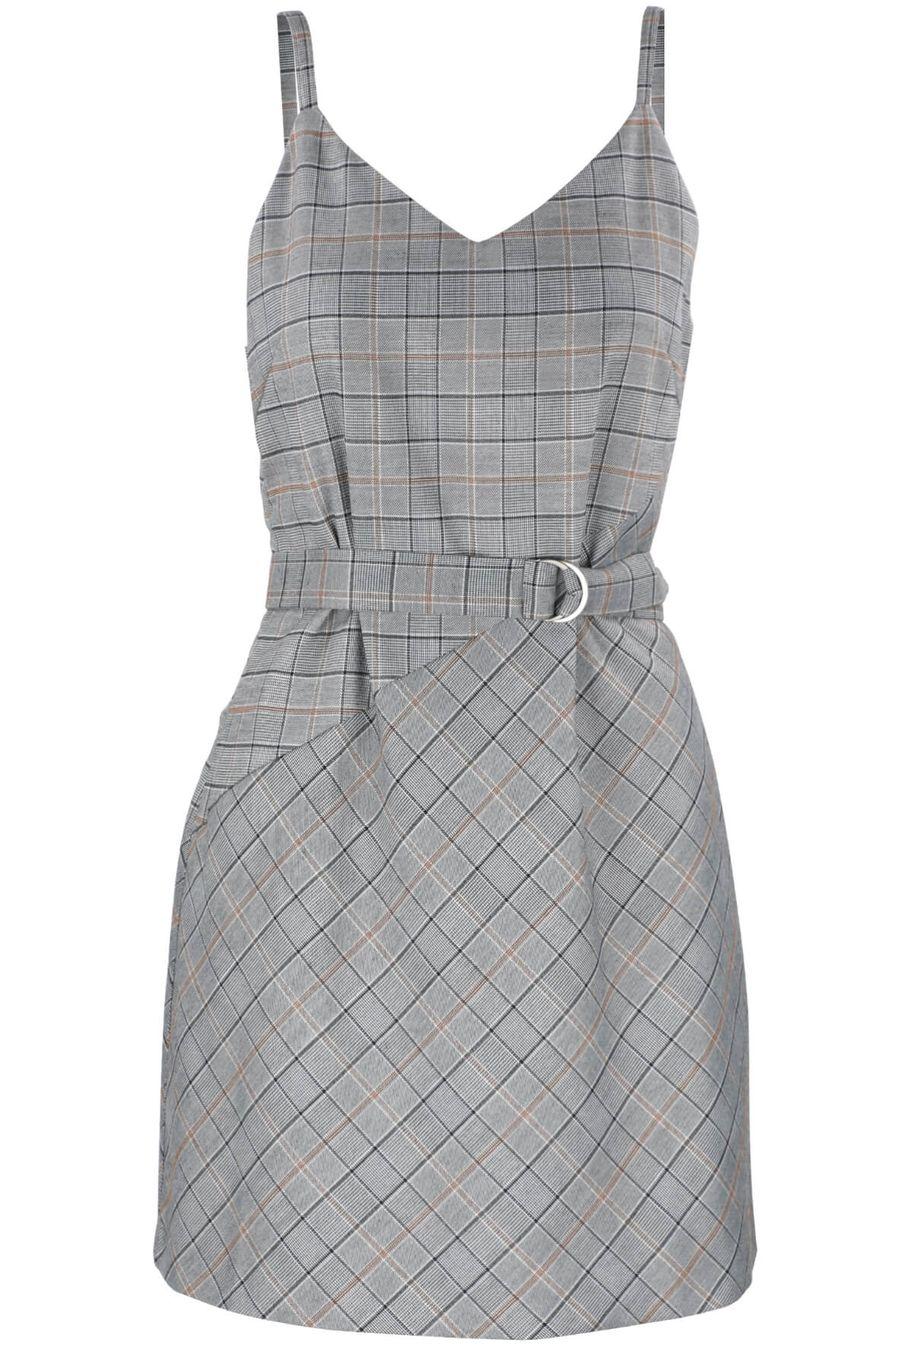 petite-studio-harper-dress-1